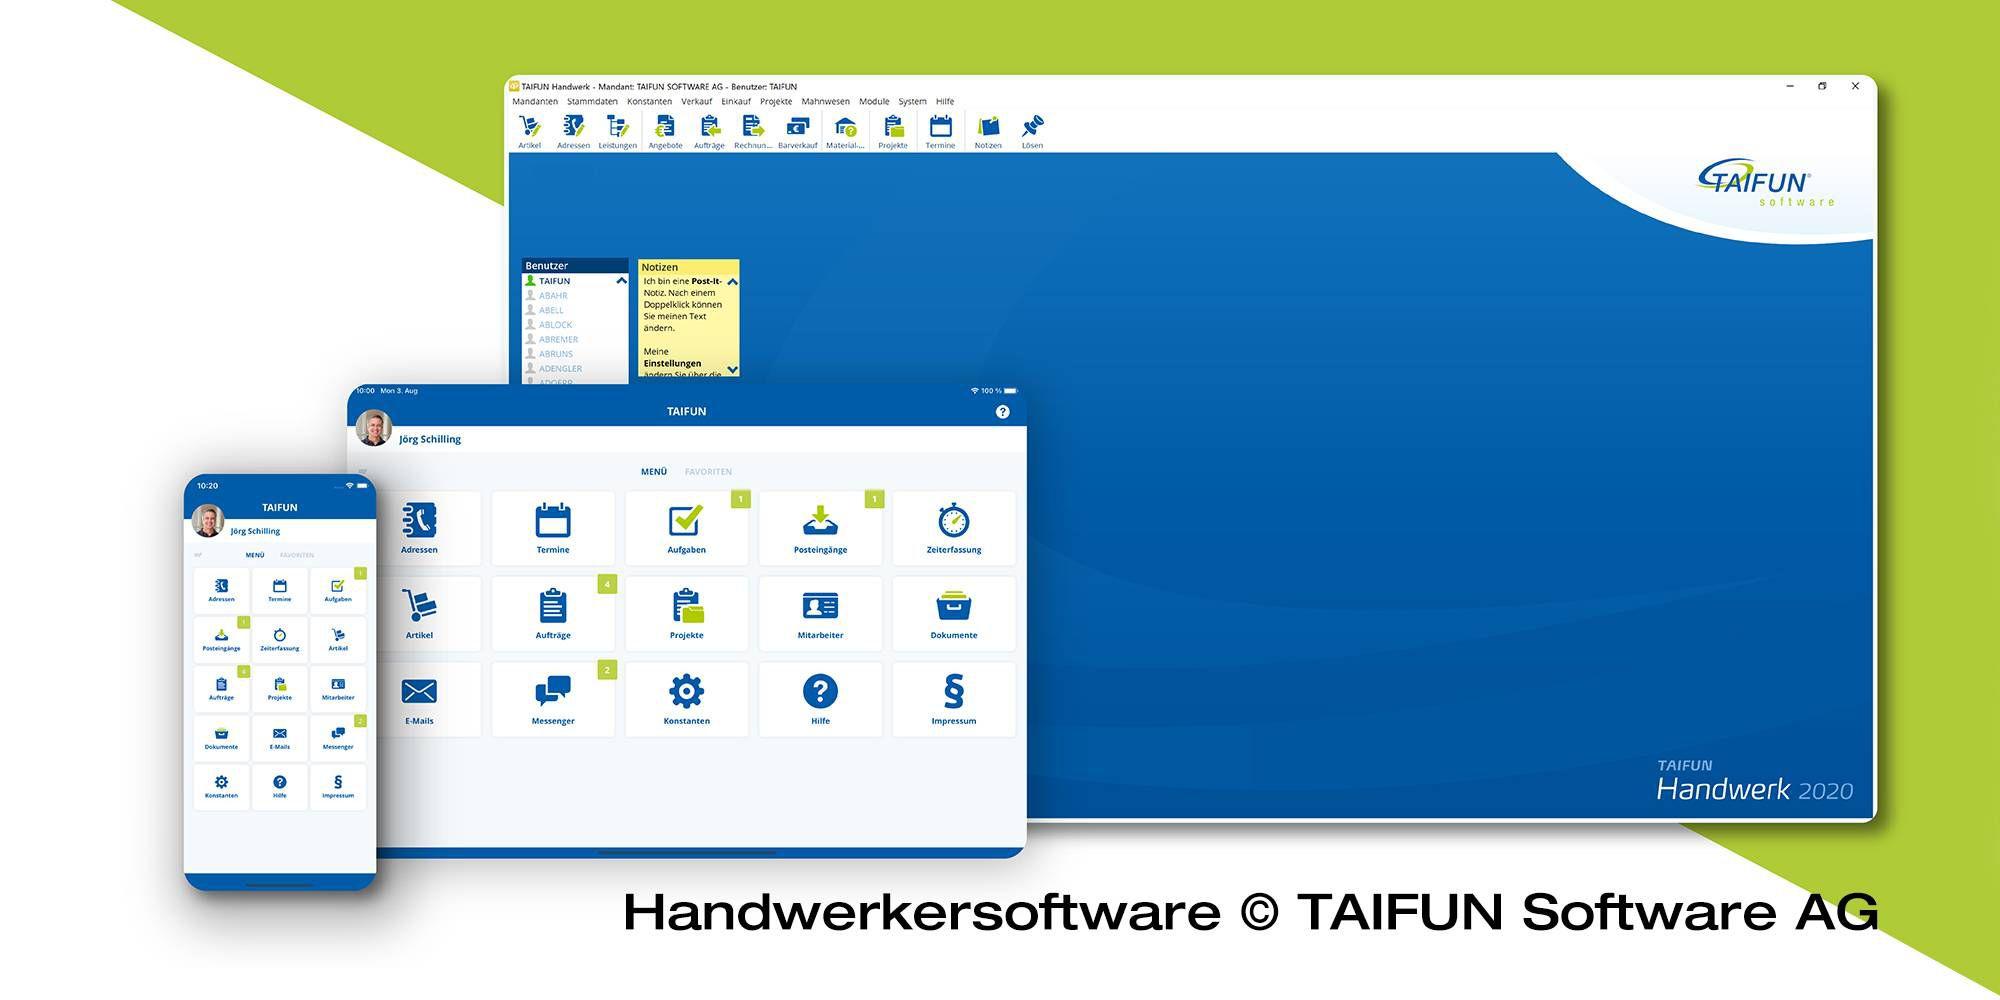 Handwerkersoftware © TAIFUN Software AG